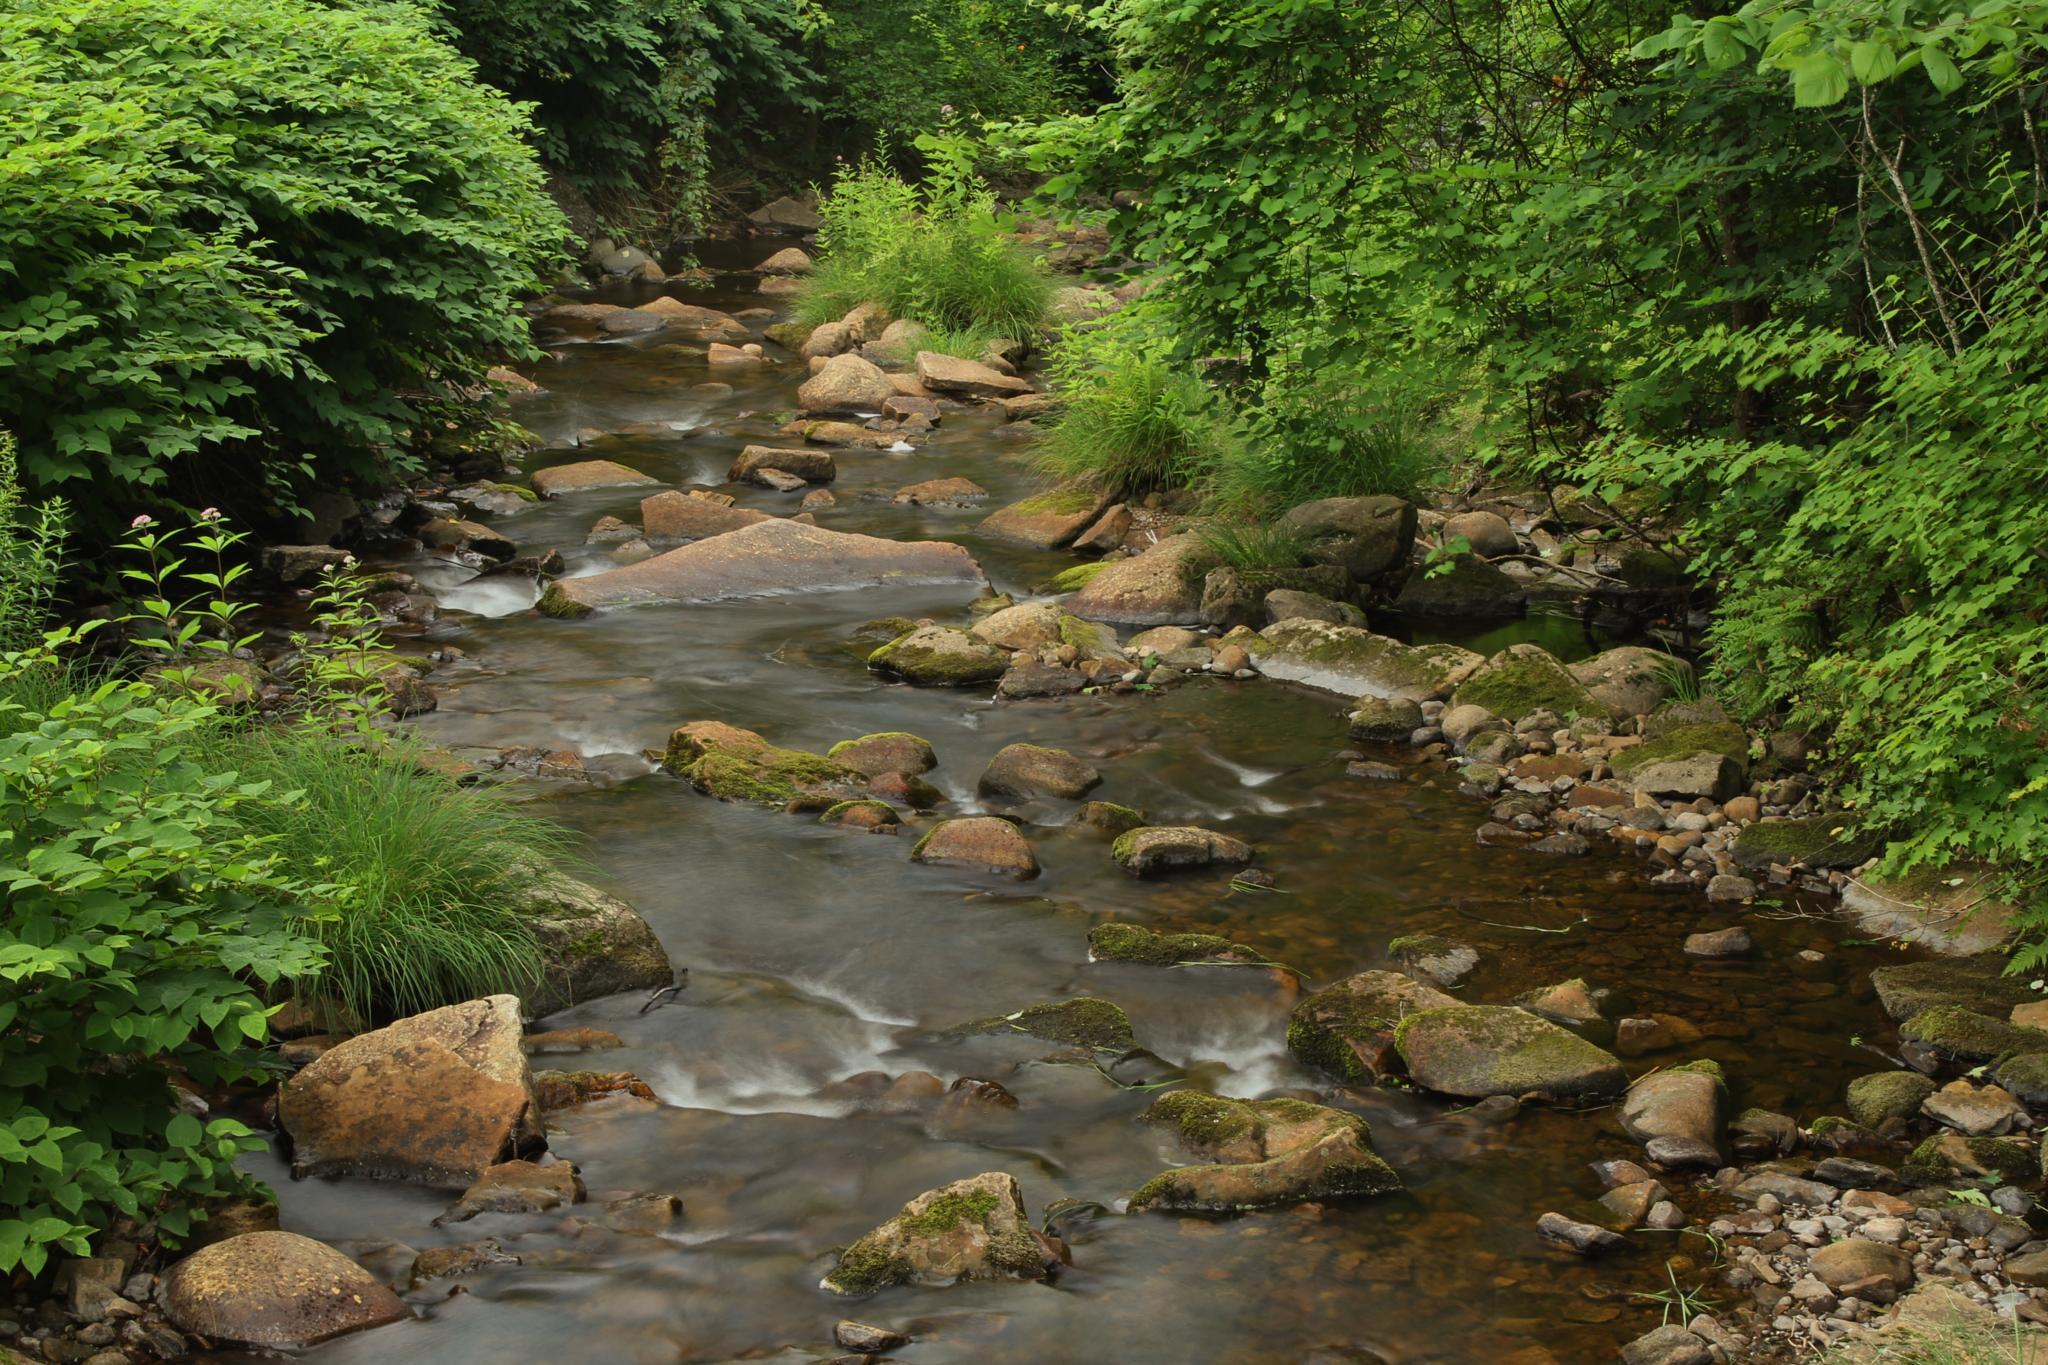 Gentle Flowing Stream by debbie.lamontesnyder